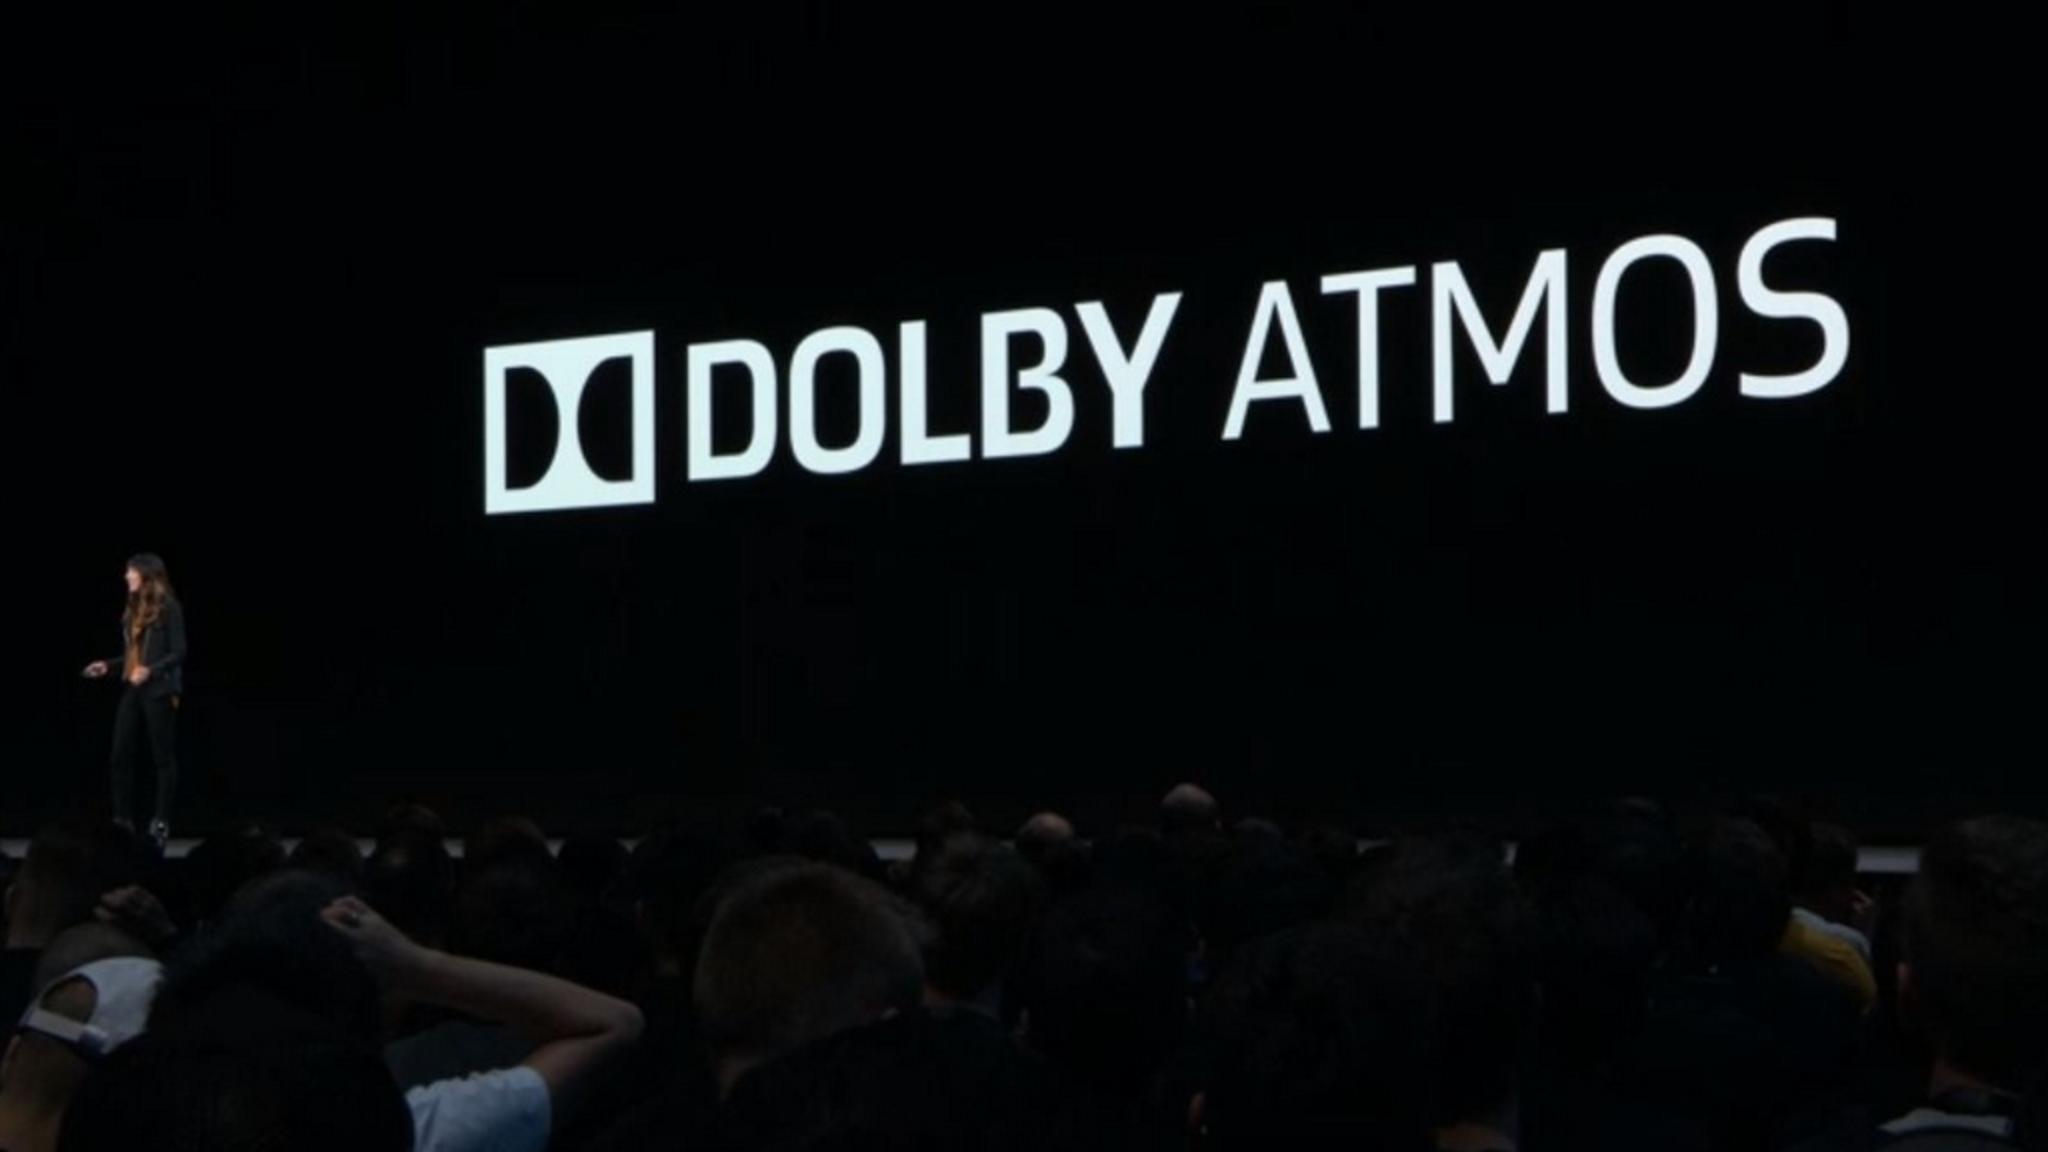 Dolby-Atmos-Apple-TV